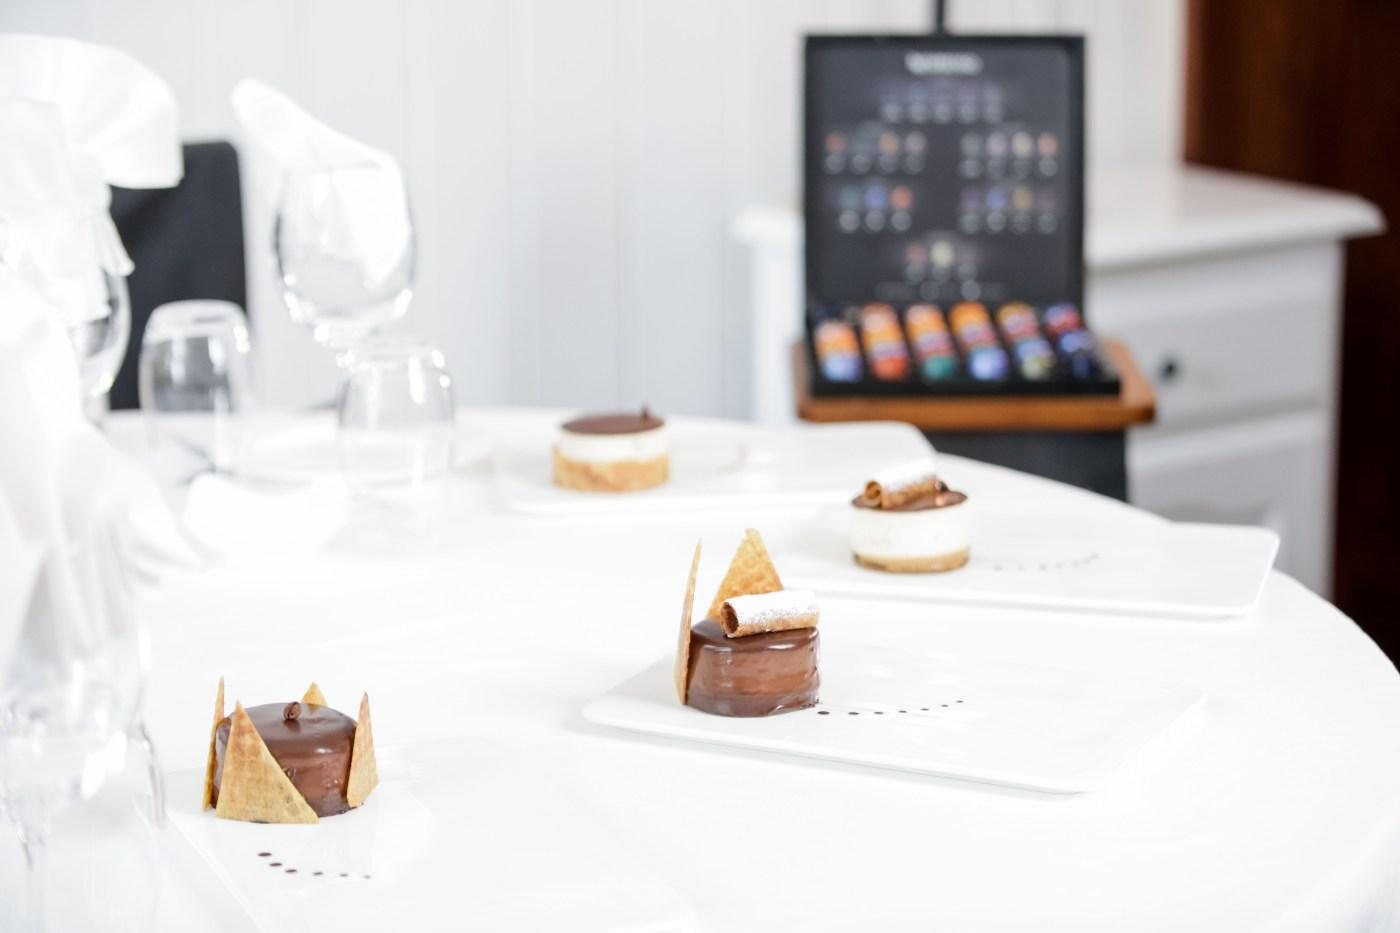 Itinéraire Gourmand : on mange quoi ?, nespresso, serialfoodie, evenement, abidjan, cote d'ivoire,